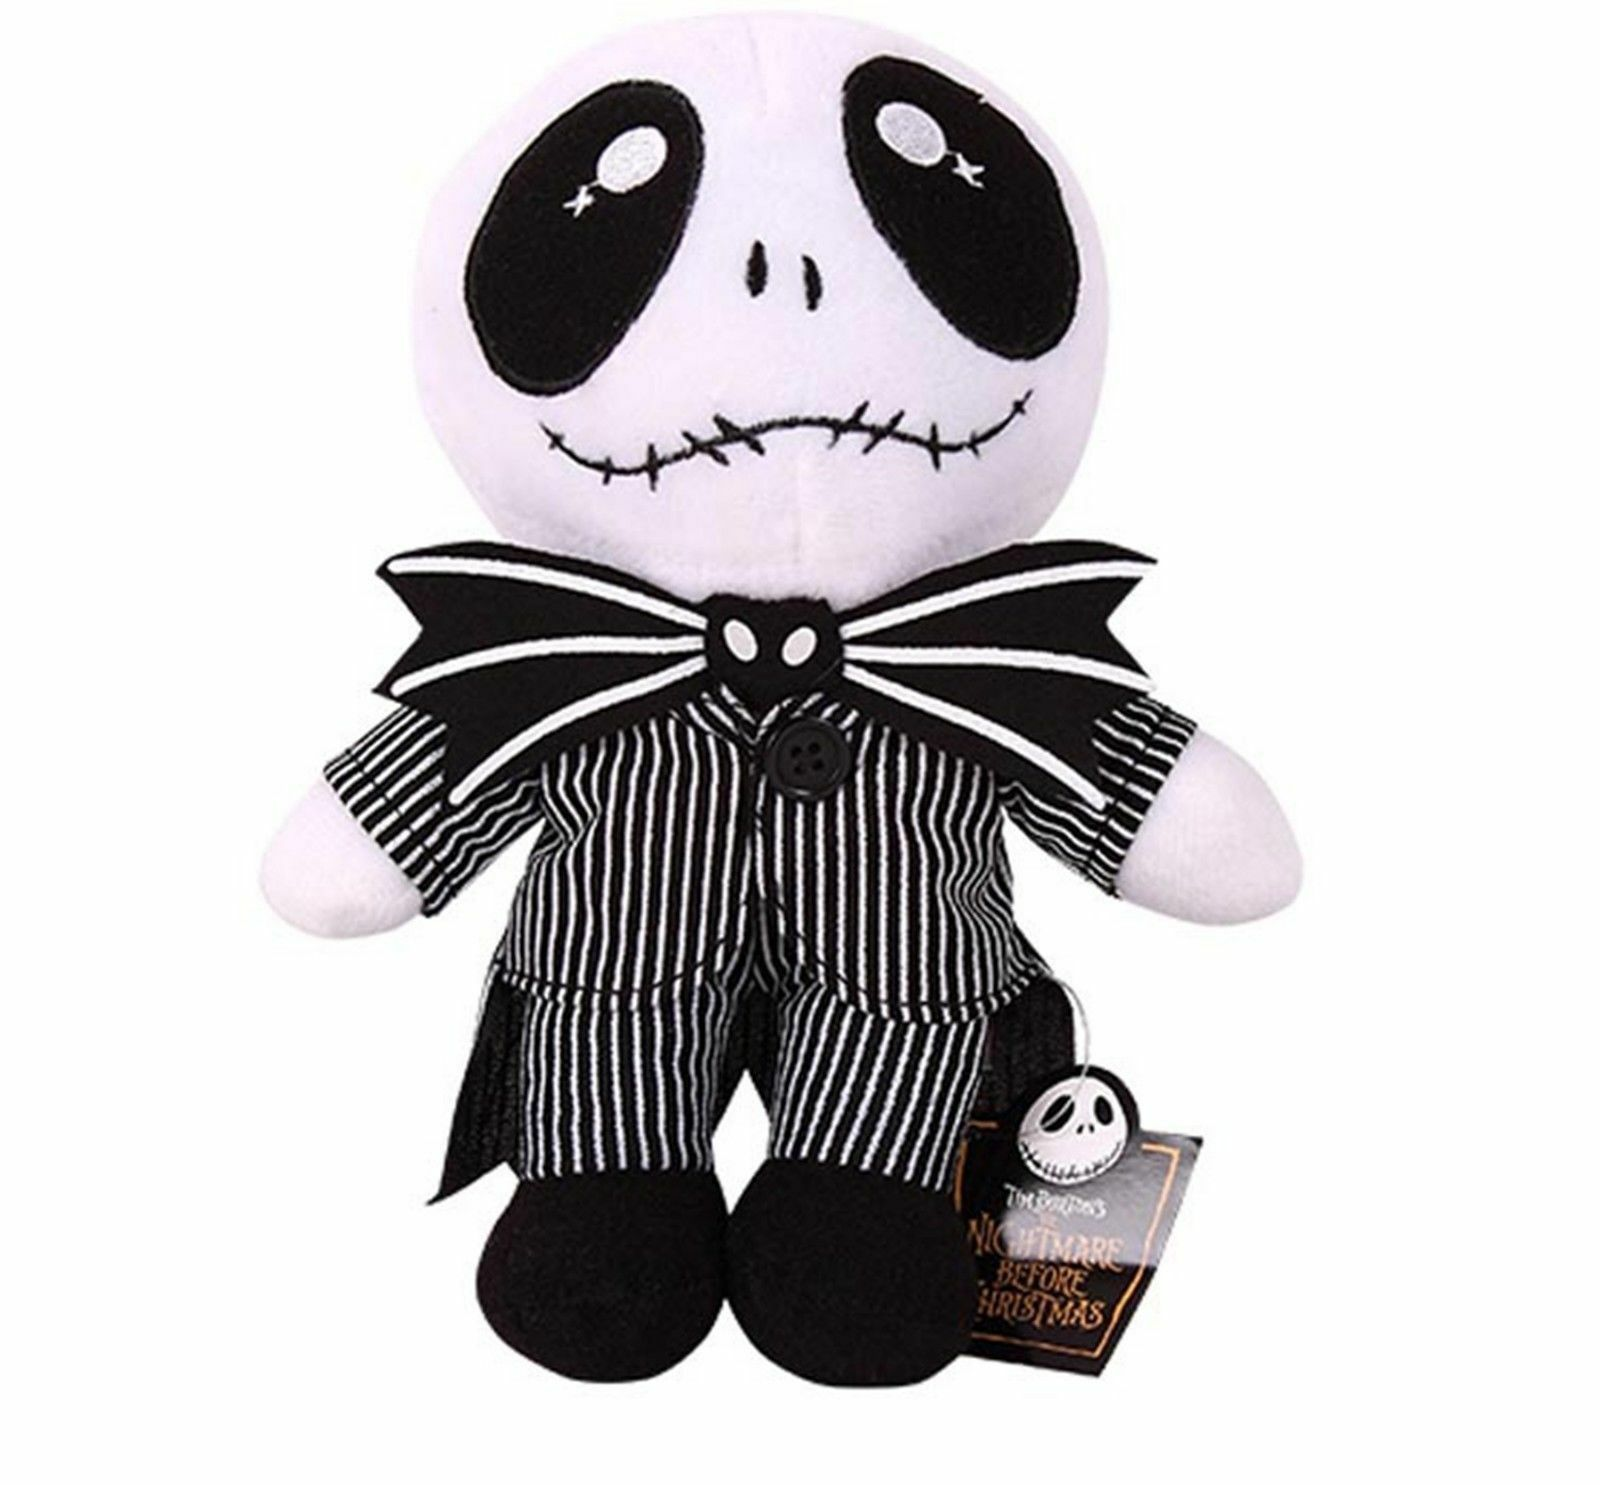 THE NIGHTMARE BEFORE Christmas Baby Jack Skellington Plush Doll ...